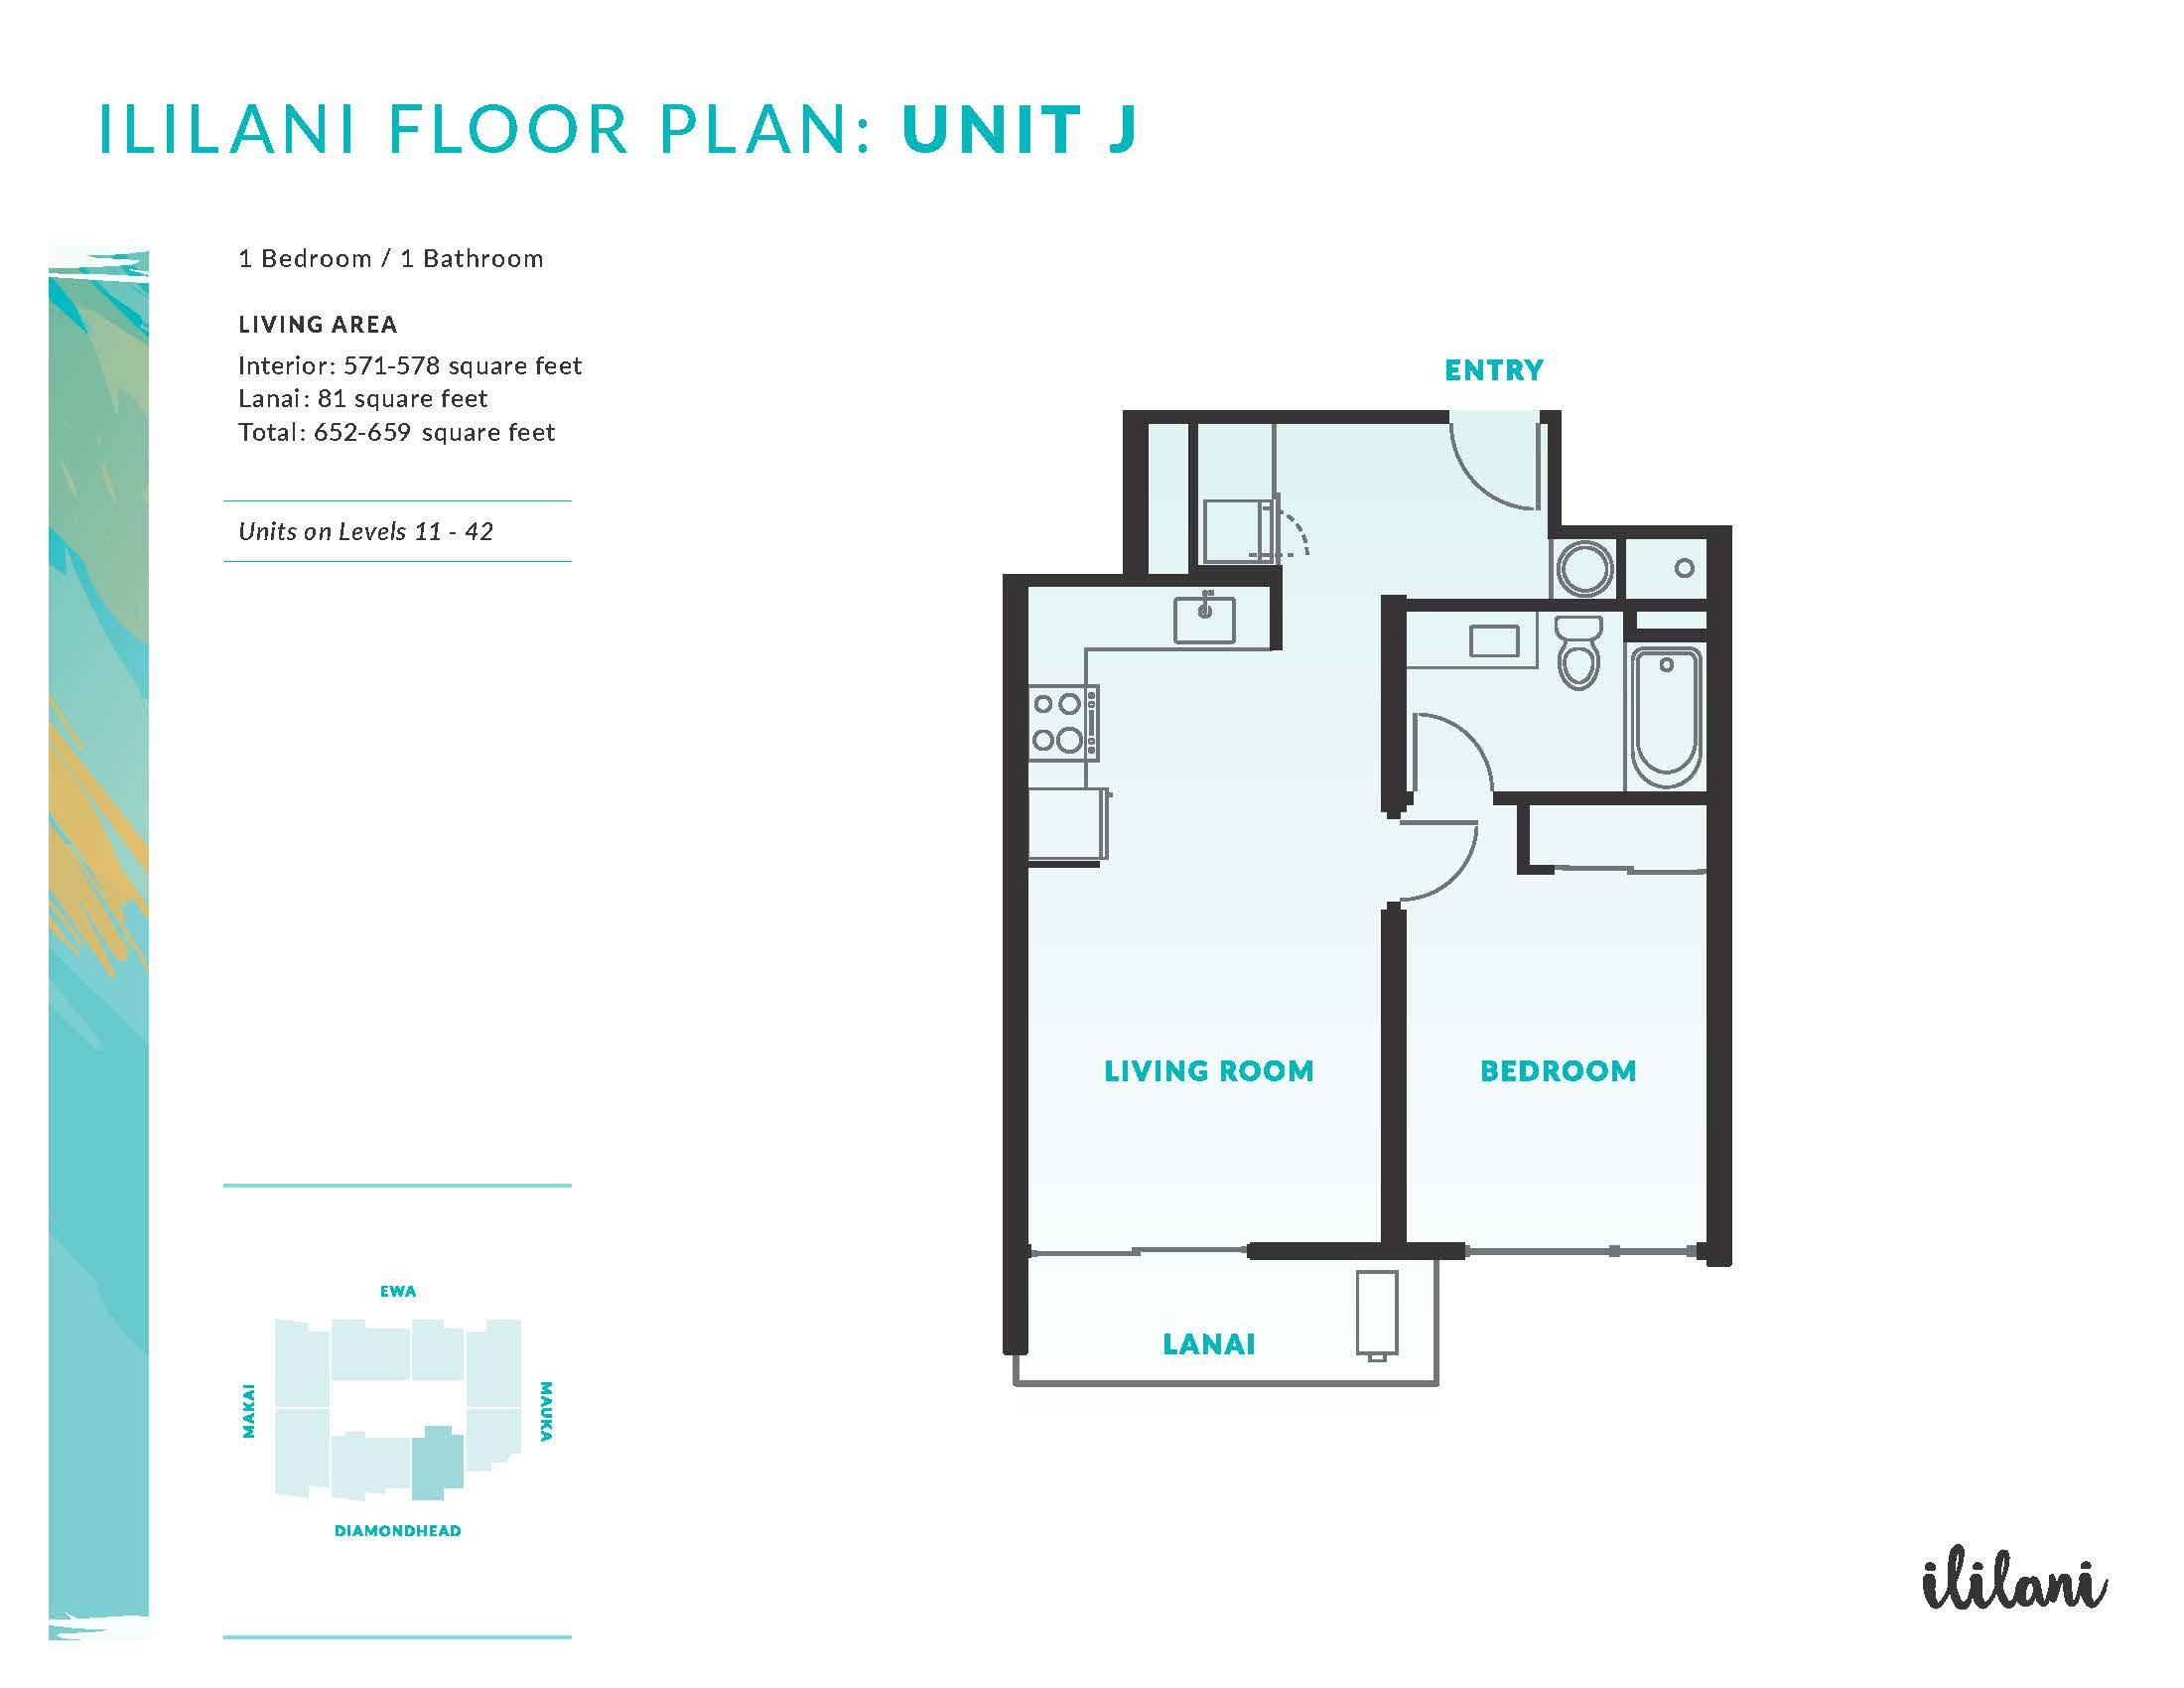 Ililani Floor Plan J